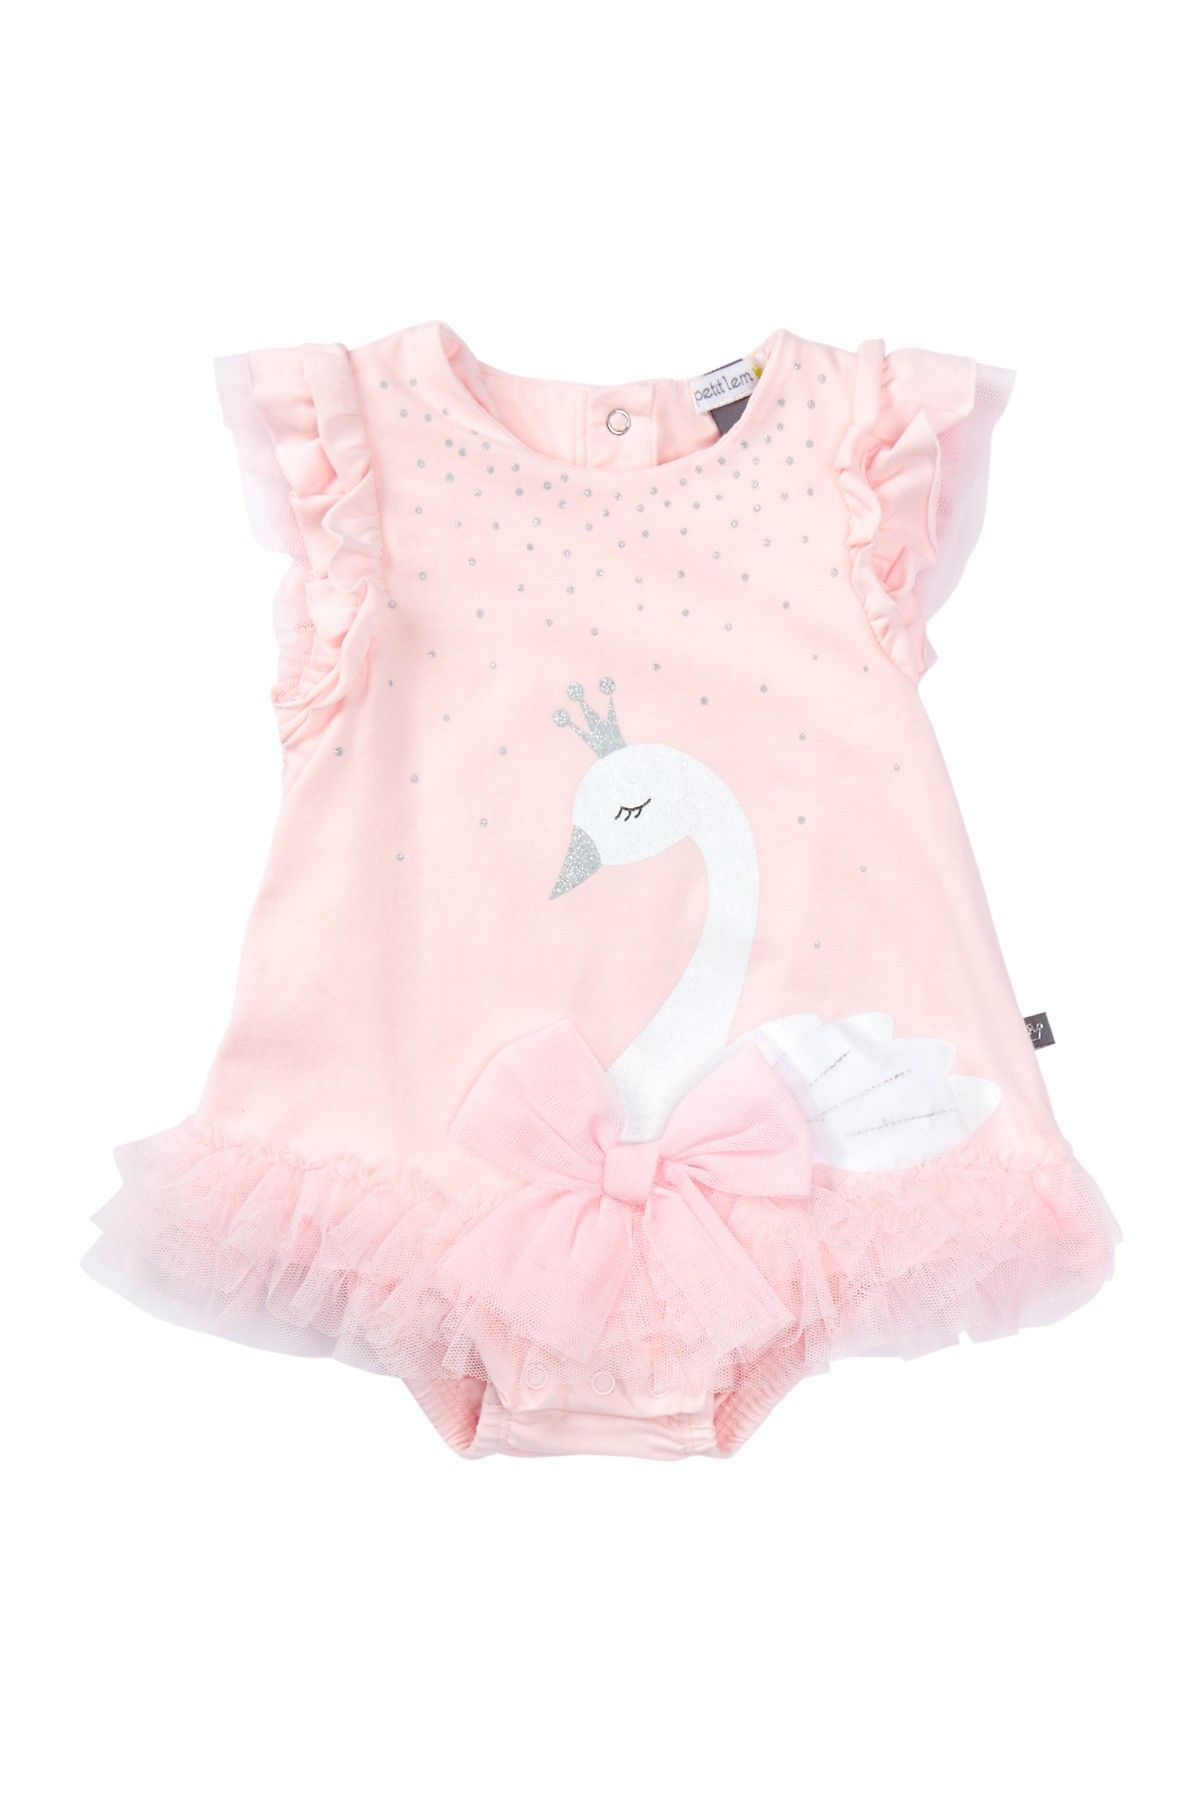 Swan Dress Bodysuit Baby Girls